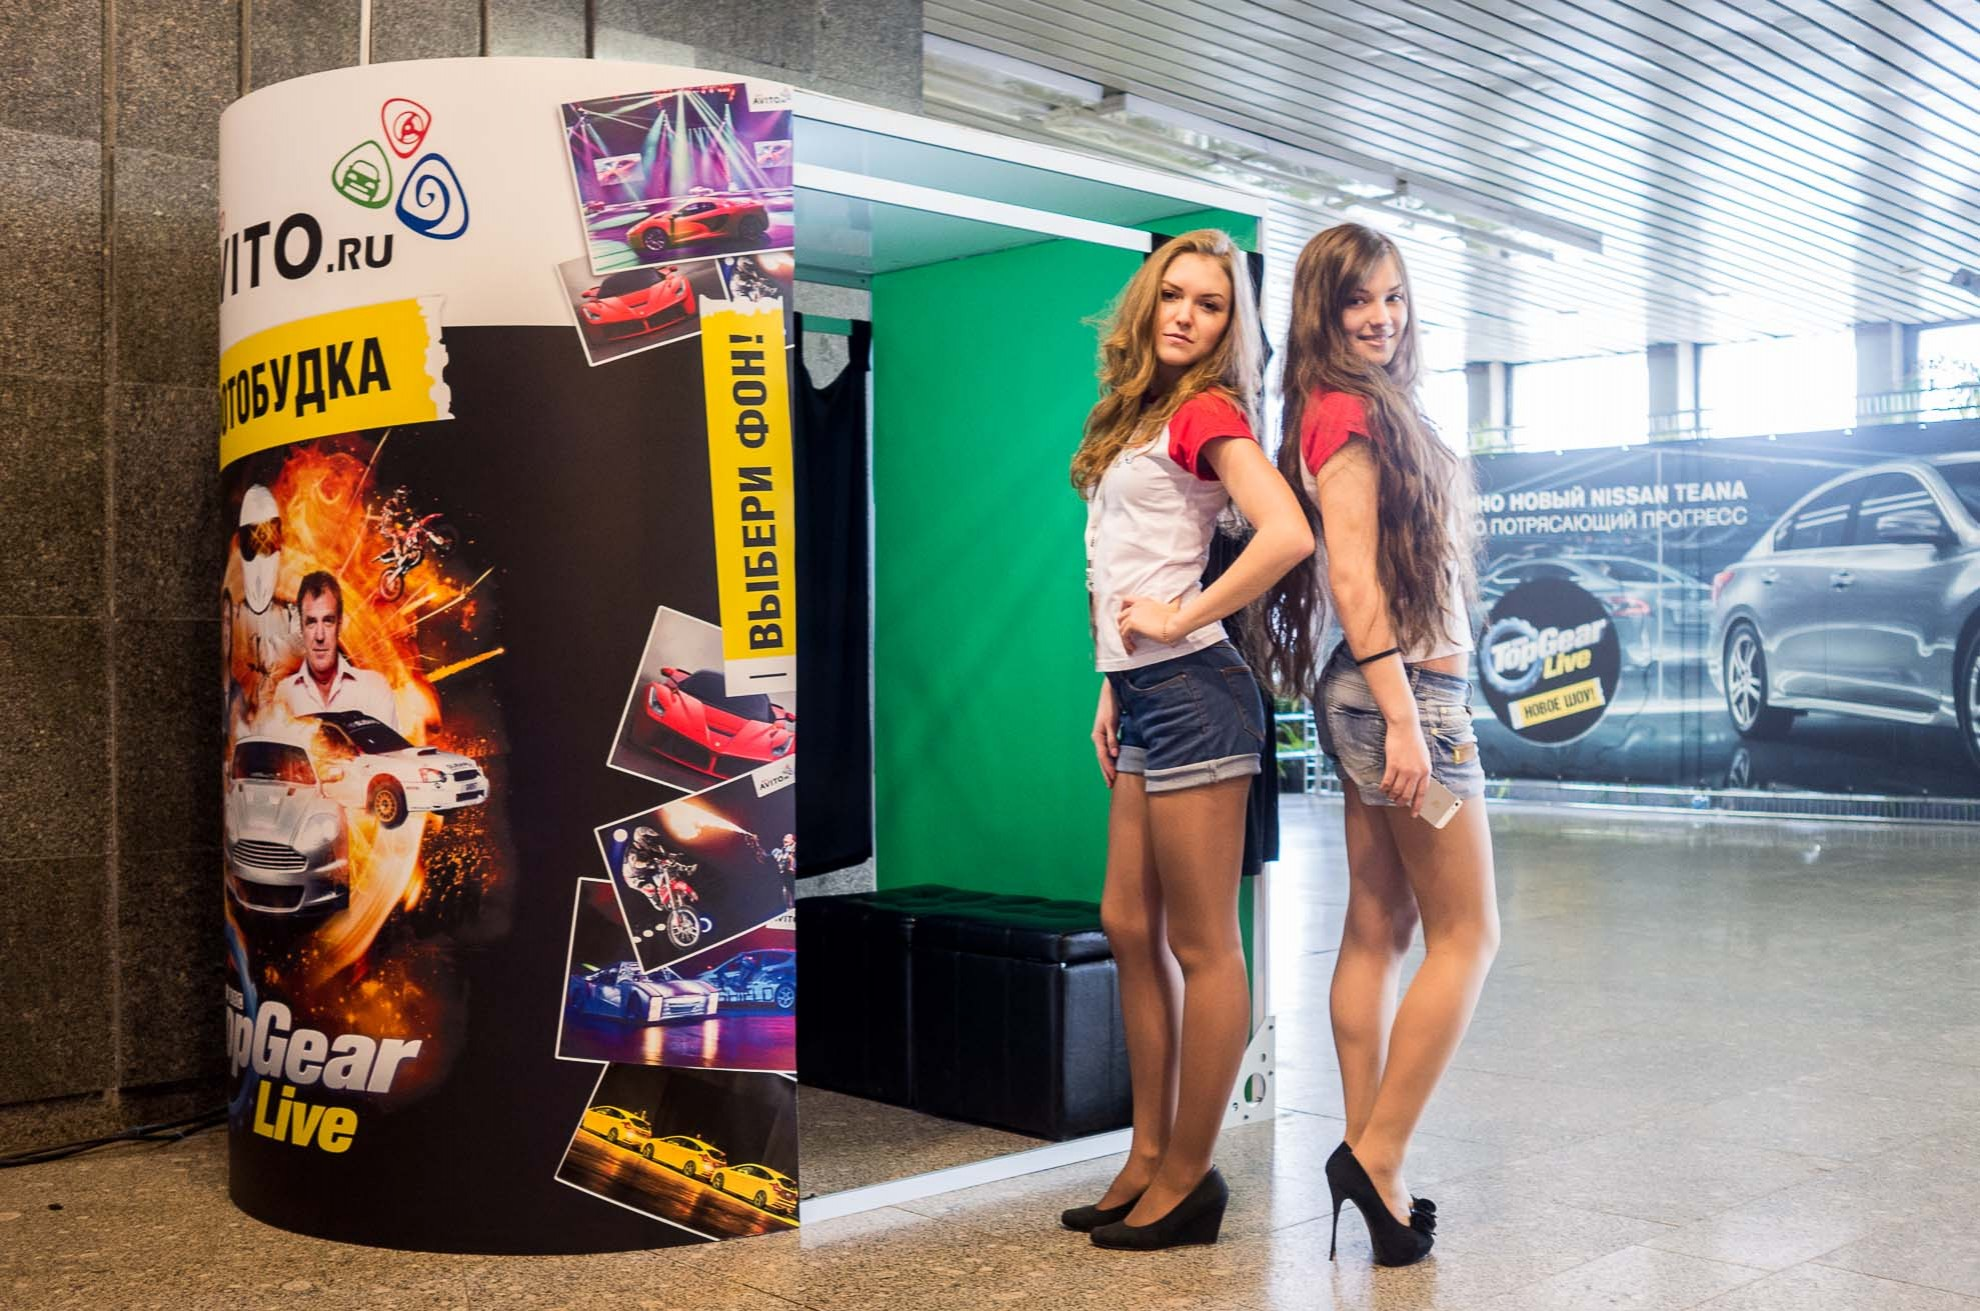 AVITO Top Gear Live, Москва, Санкт-Петербург